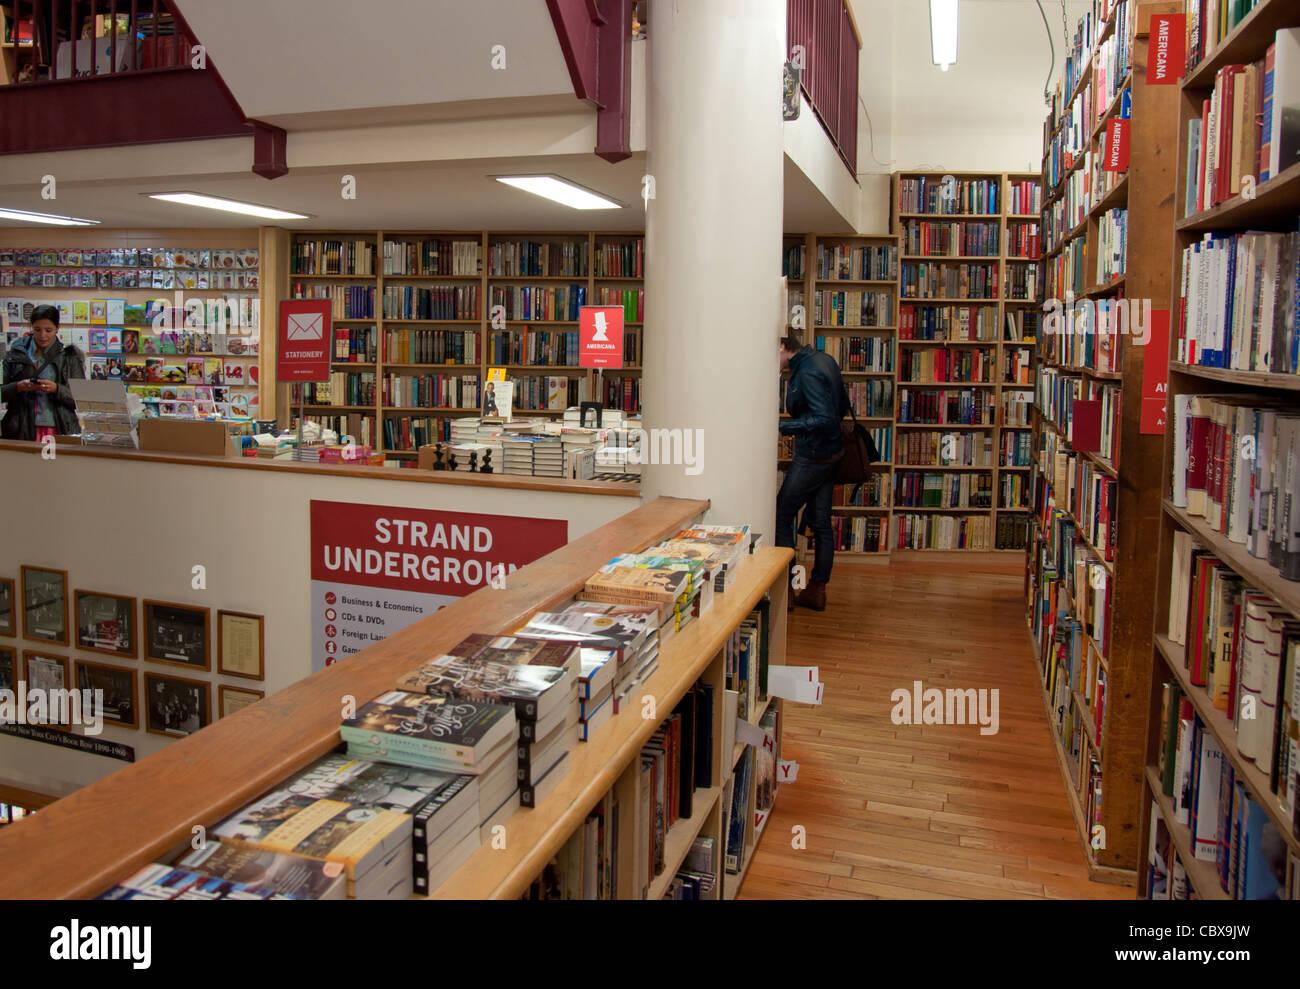 Strand Famous Bookstore on 828 Broadway, Manhattan (New York City) - Stock Image